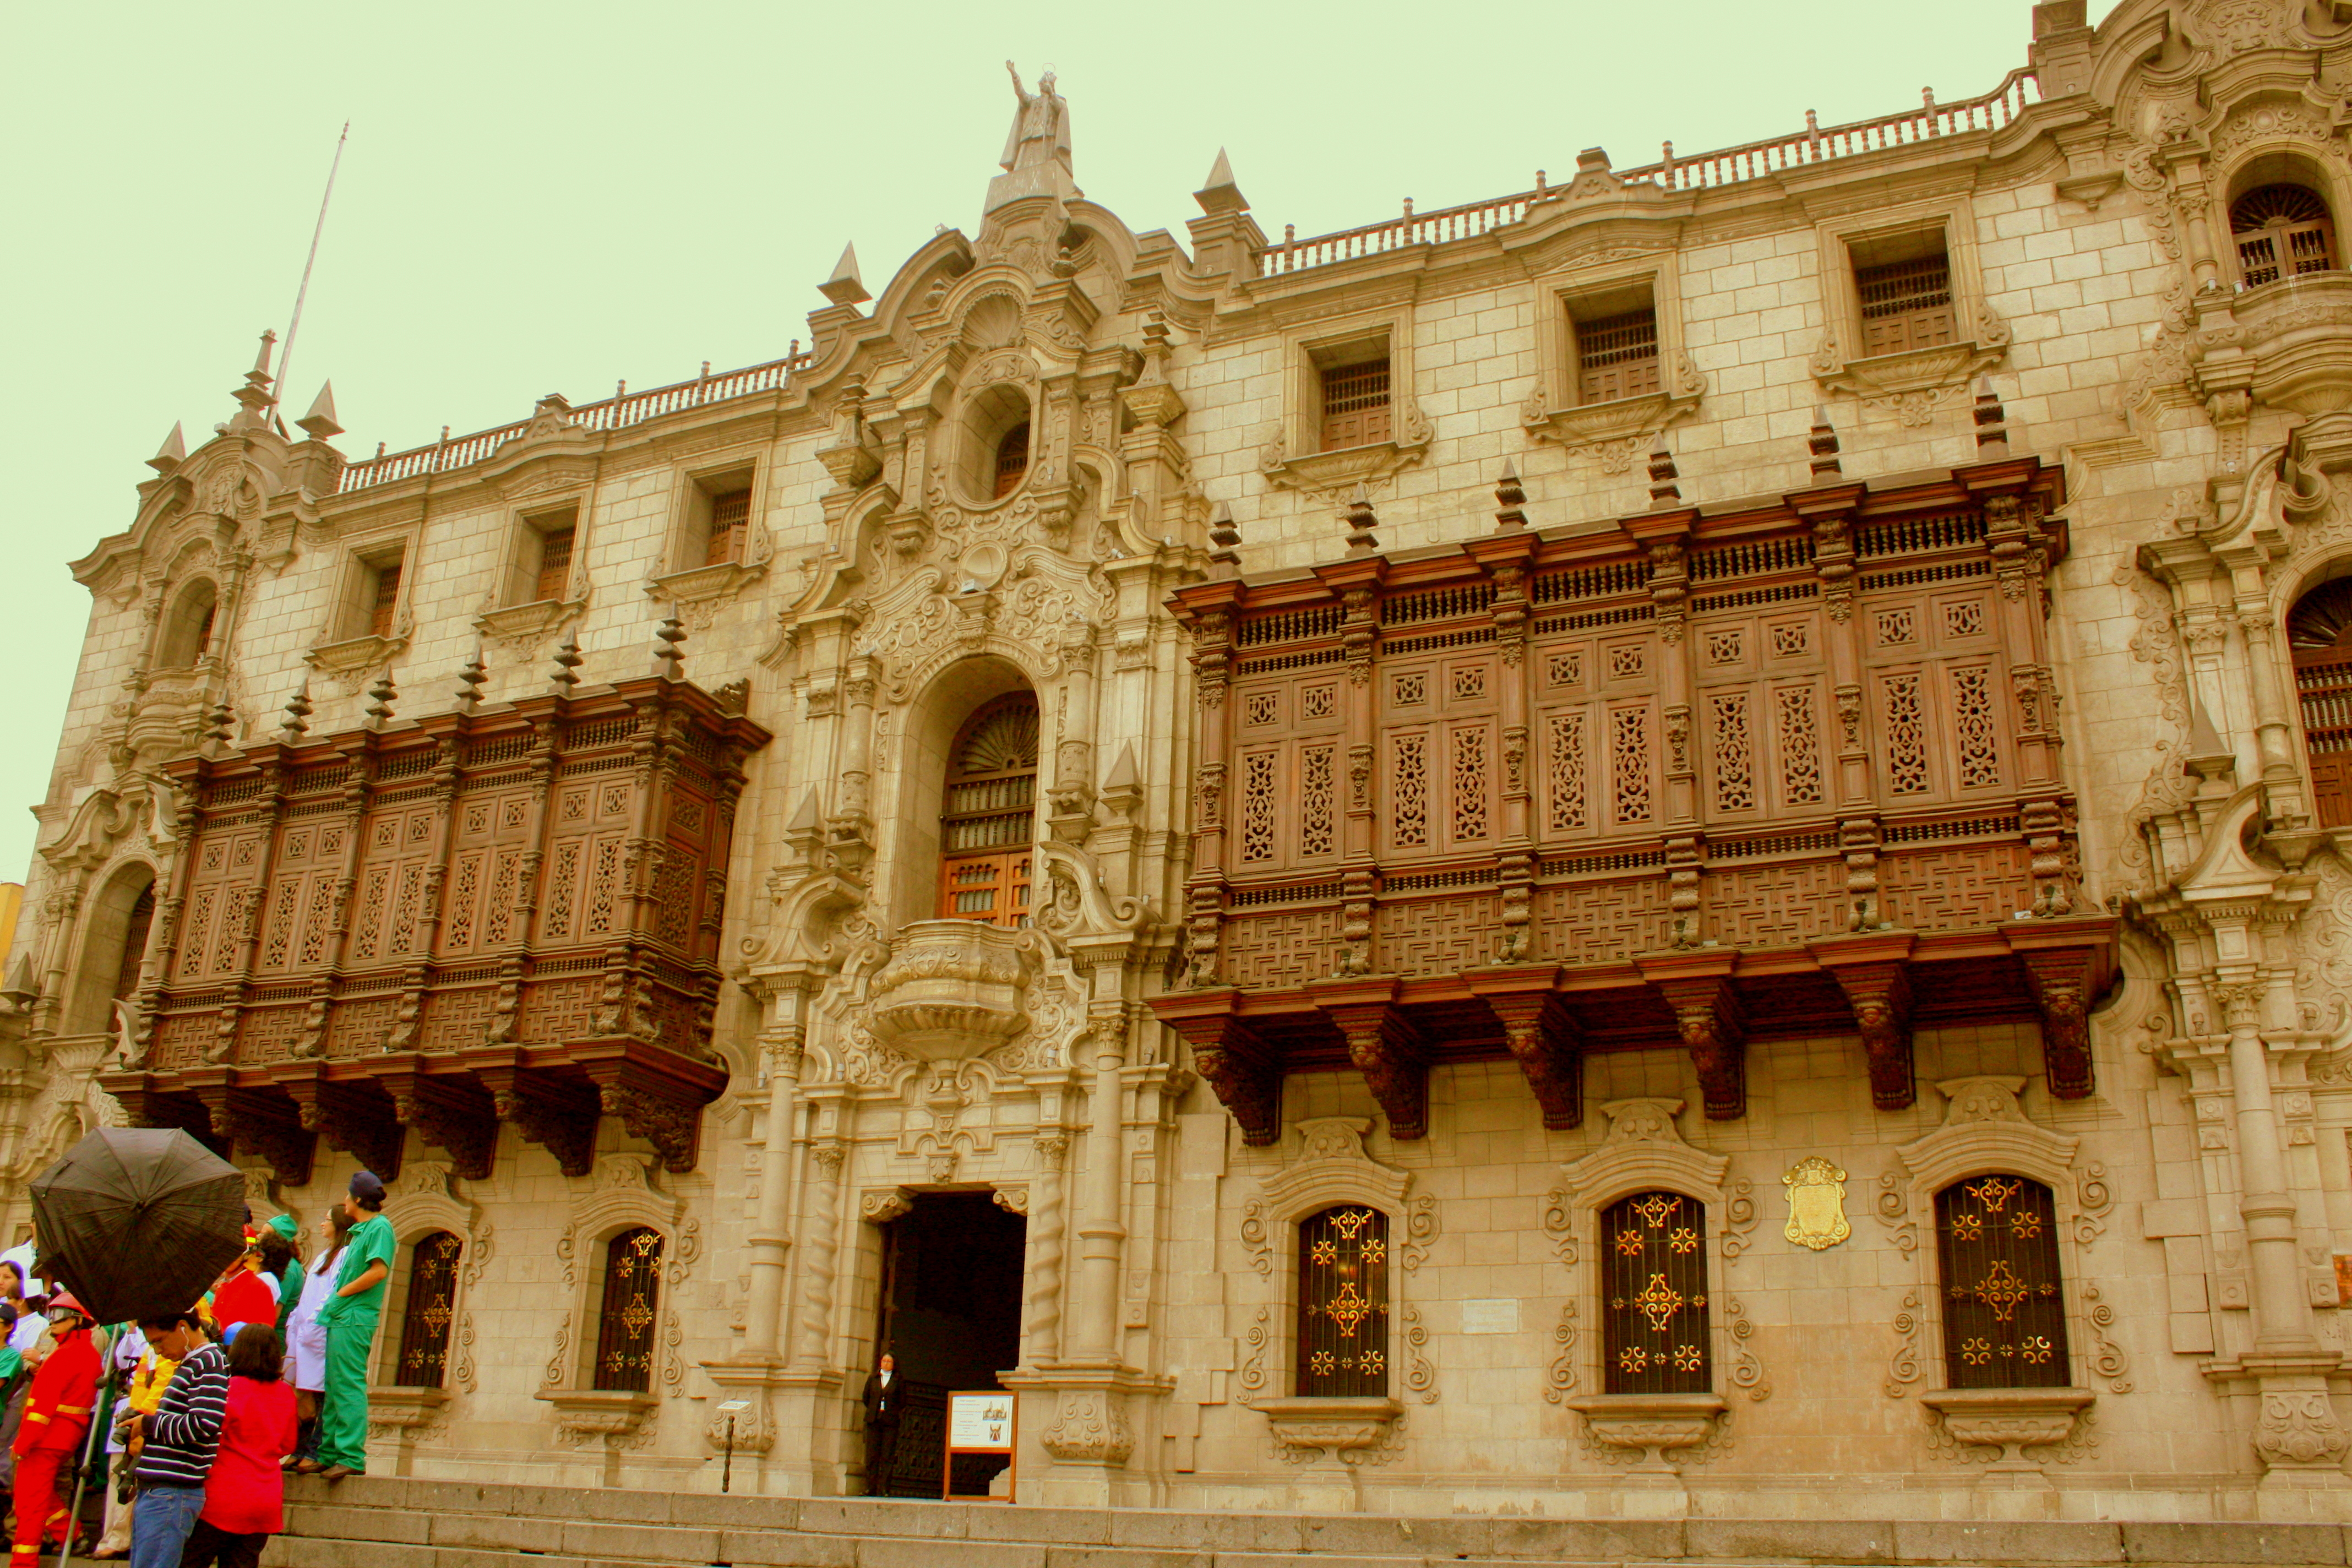 moorish architecture lima peru antonio ramblés travels